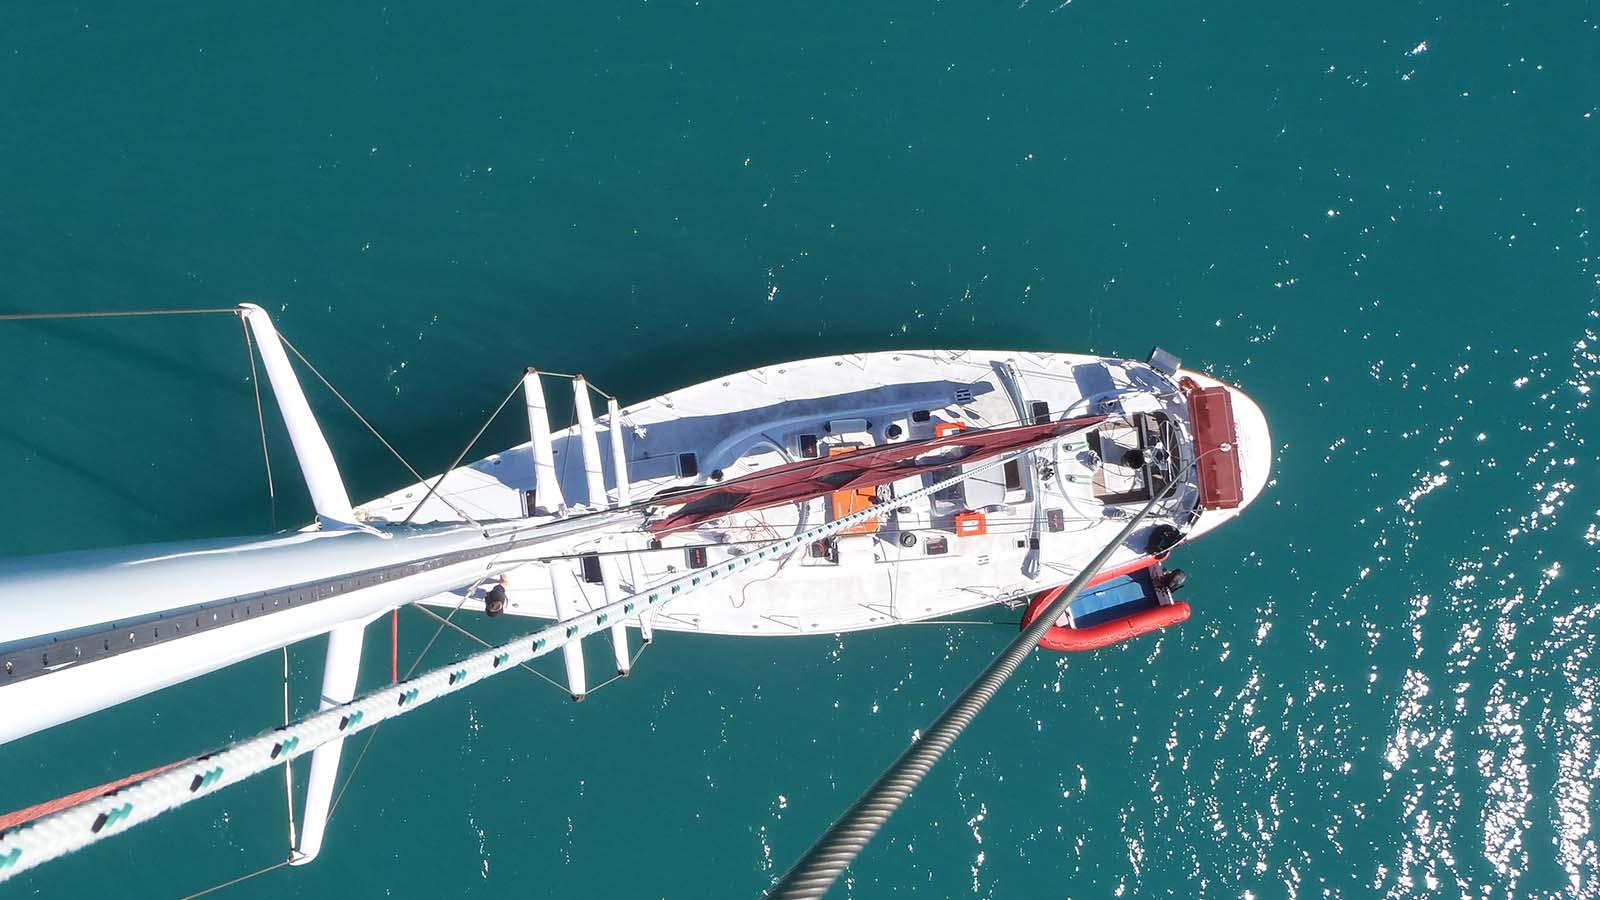 Aerial shot of boat